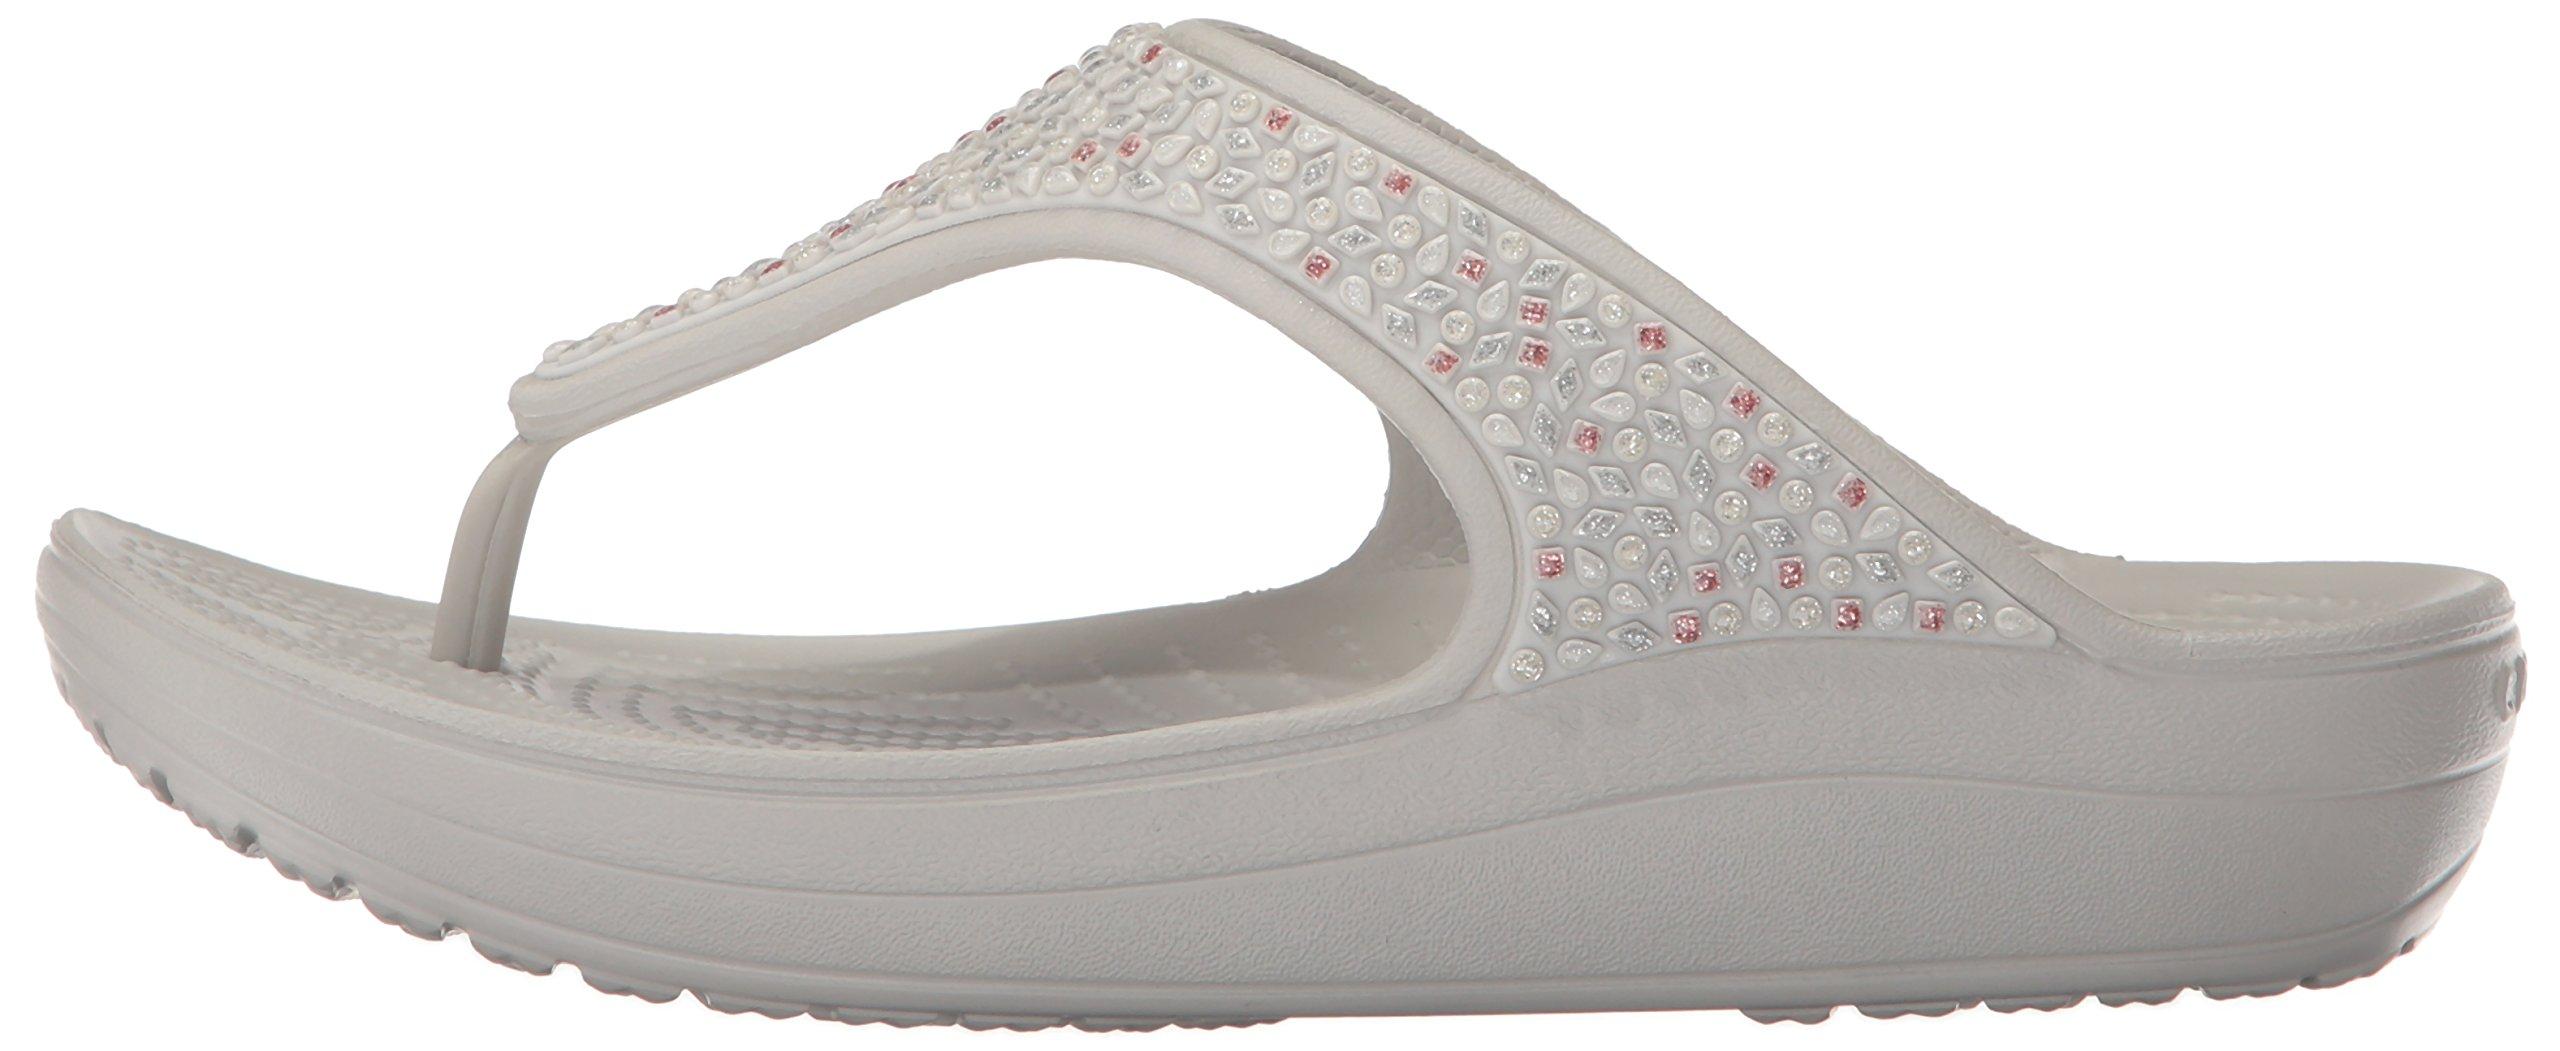 5dc031a21c33 Crocs Women s Sloane Embellished Platform Flip - CSEW9291703   Flip-Flops    Clothing